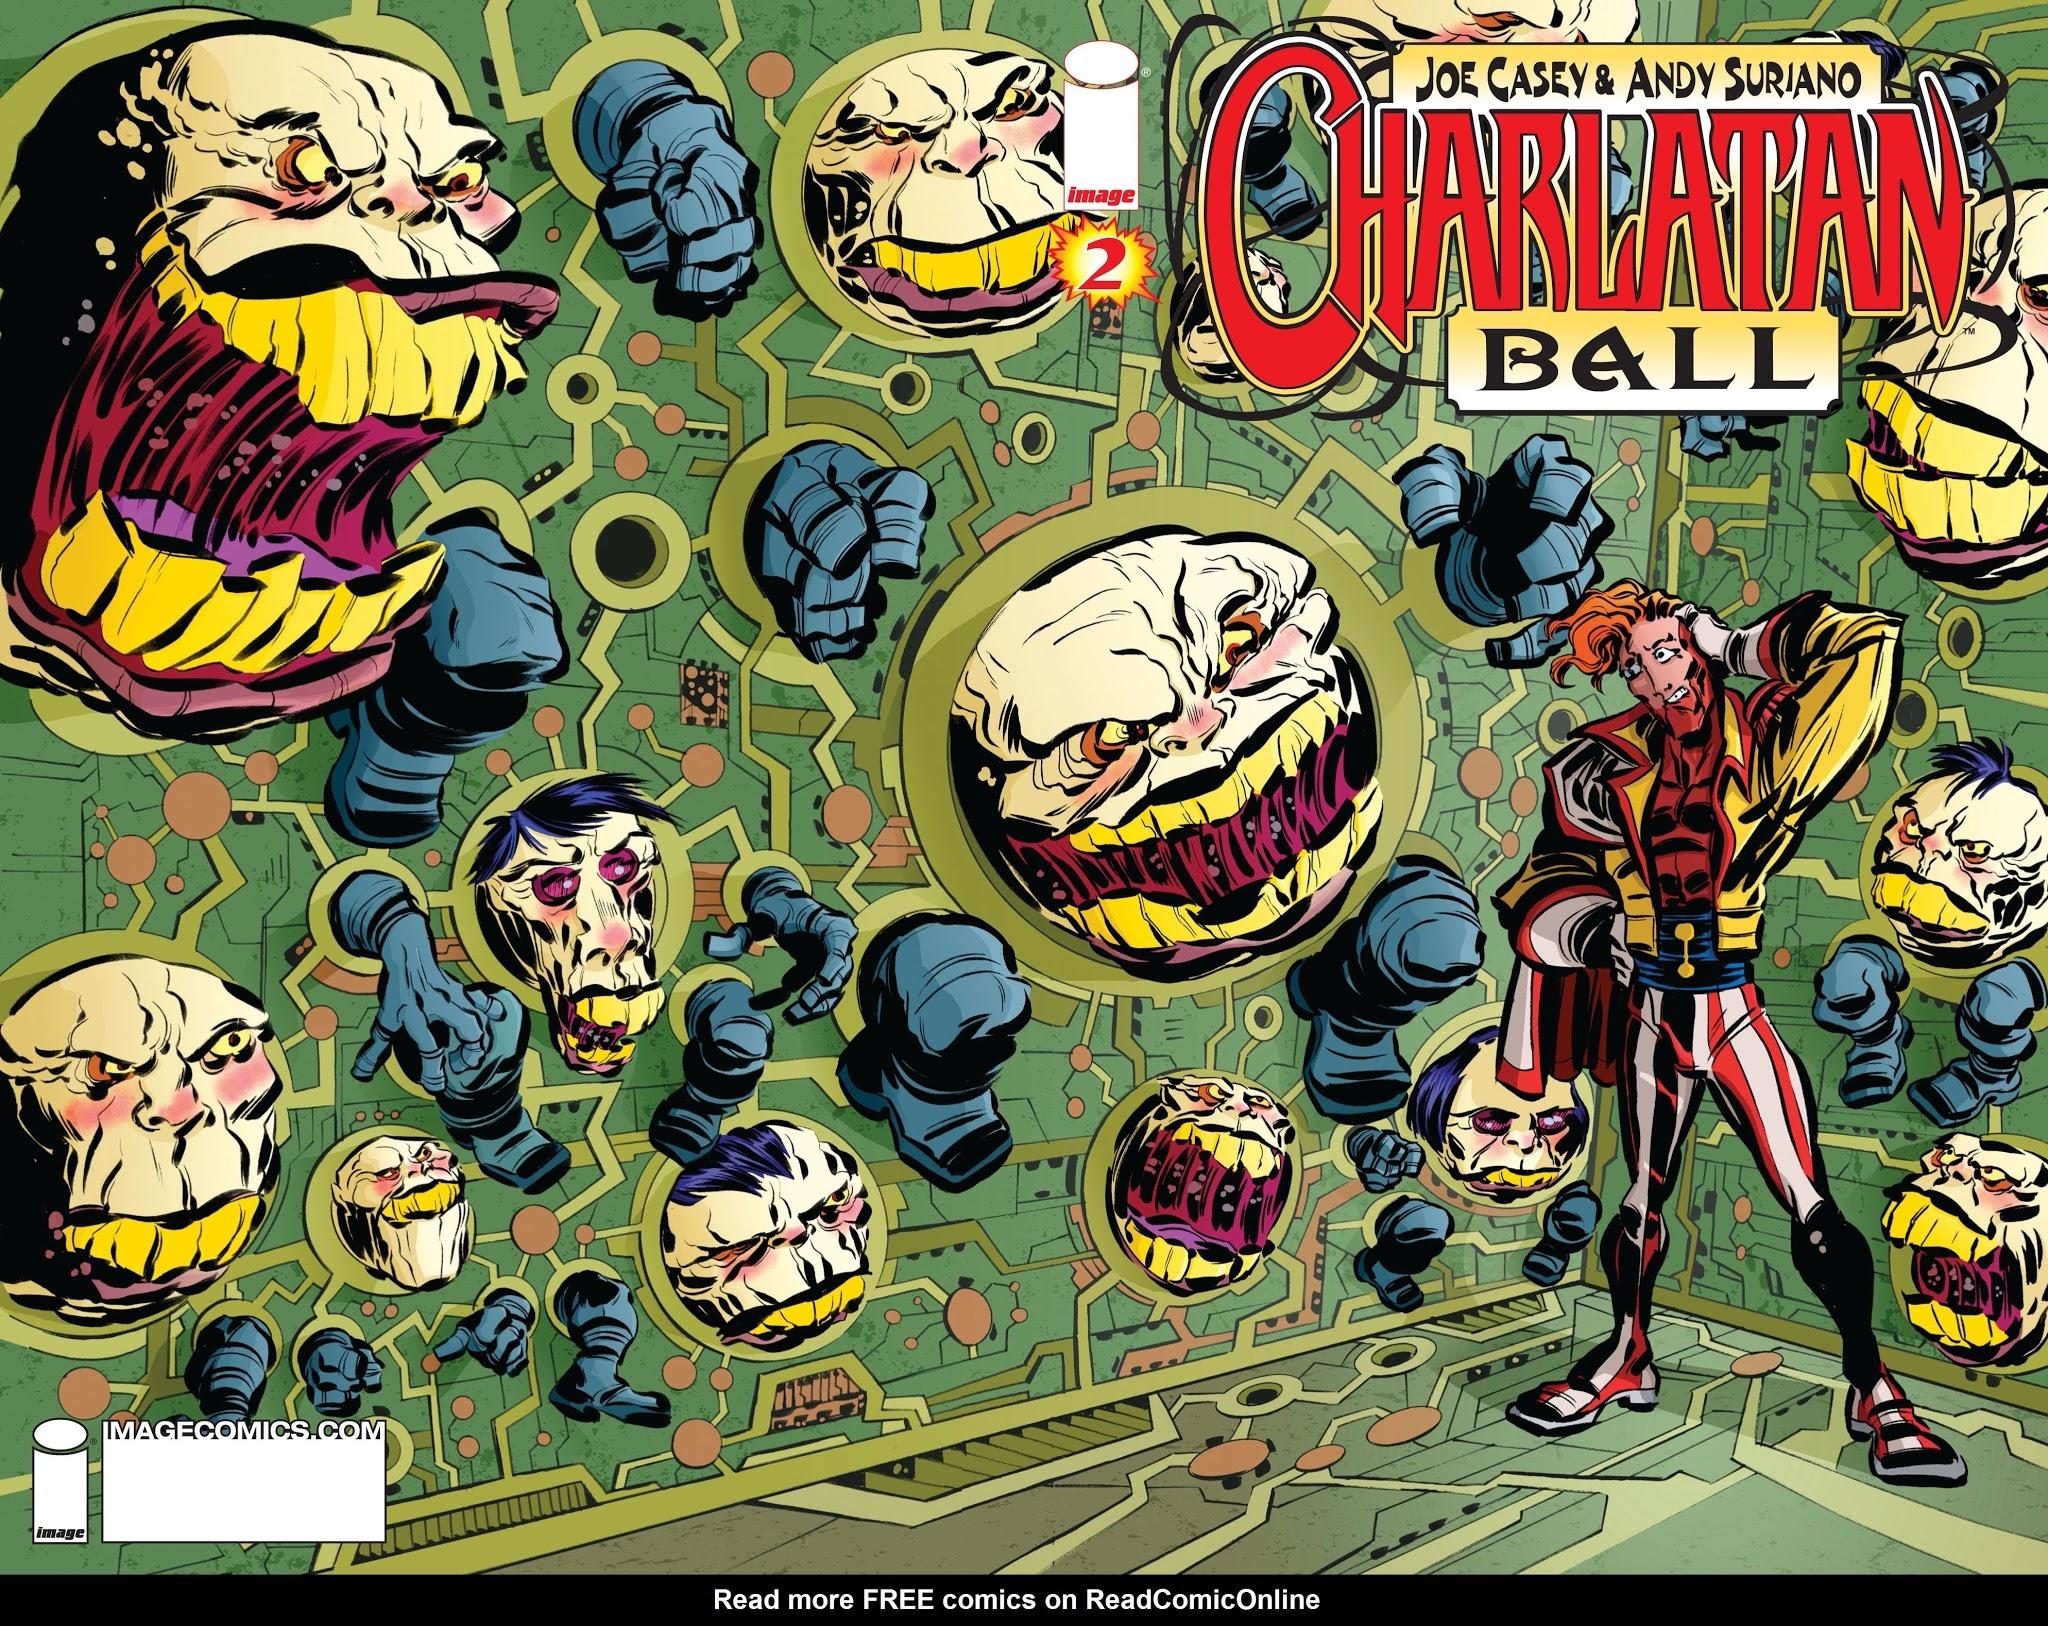 Charlatan Ball 2 Page 1